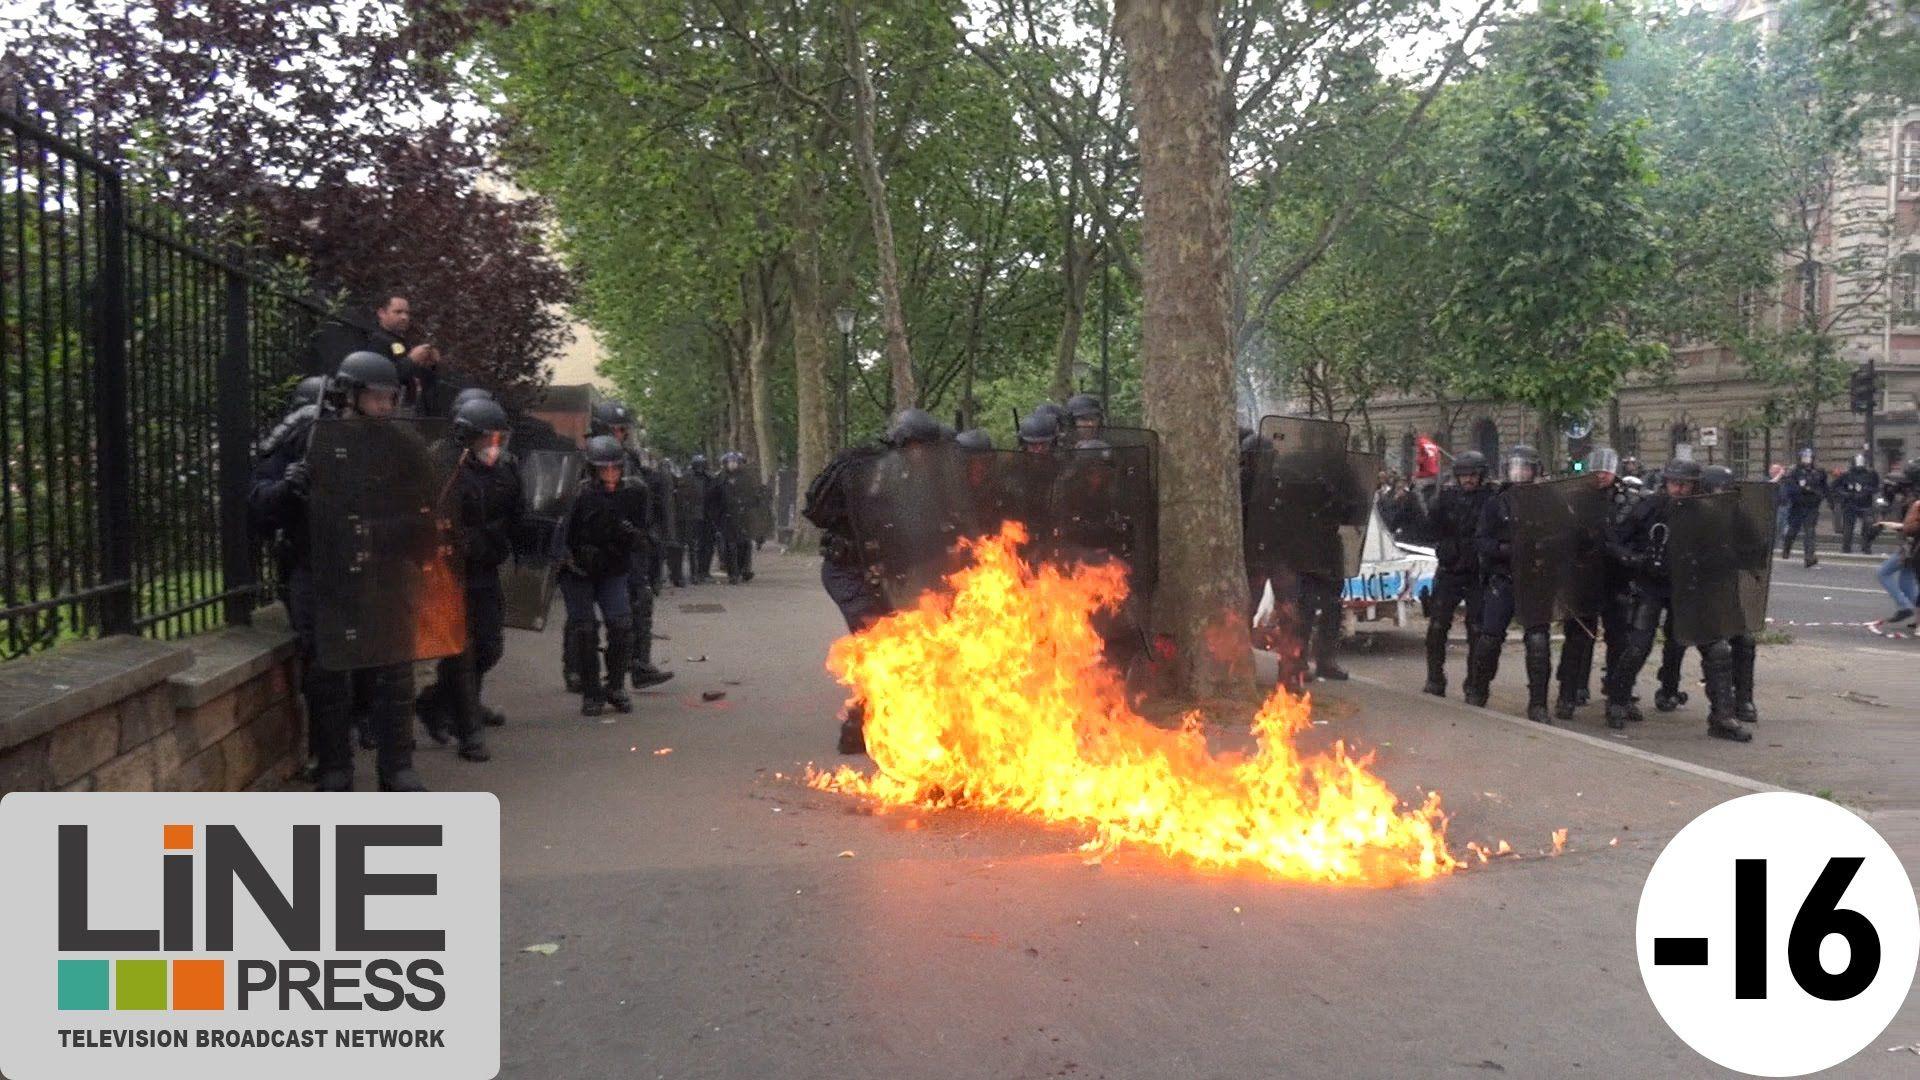 Manif Loi Travail. Violence extrême. Guérilla urbaine / Paris - France 1...